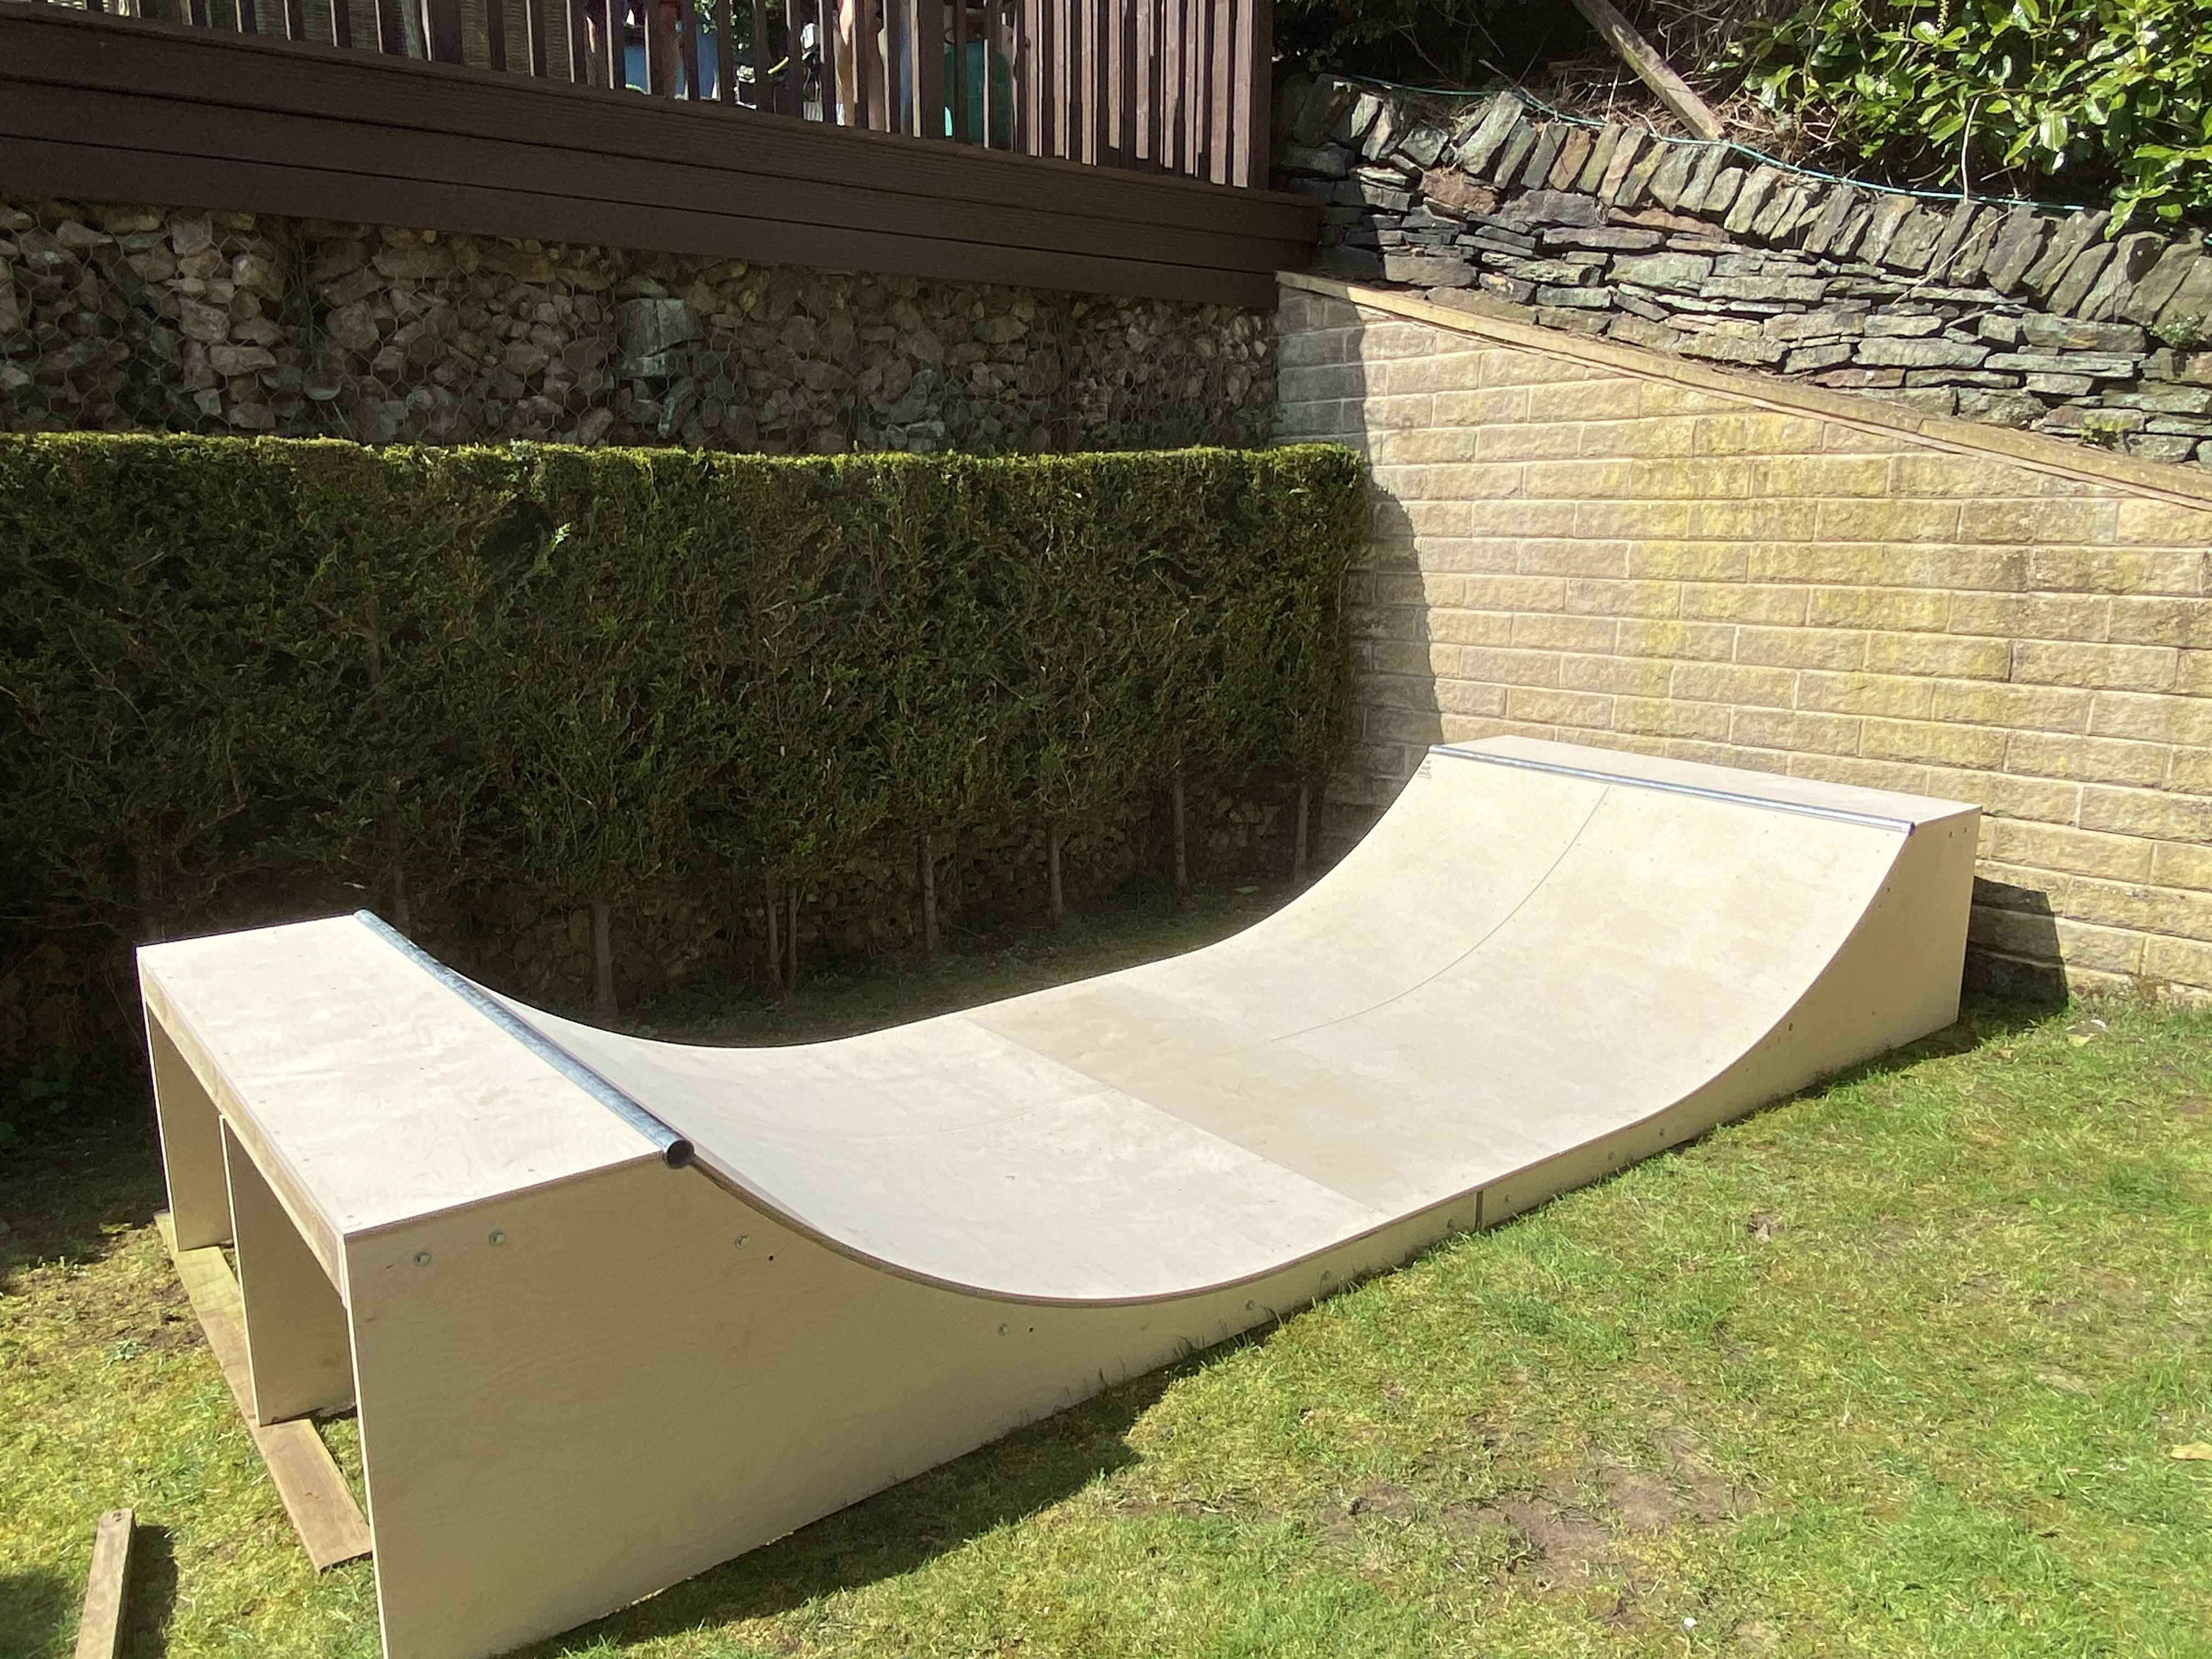 Mini Halfpipe For Sale The Ramp Supply Co Mini Ramp Skateboard Ramps Backyard Skatepark Backyard mini ramp for sale